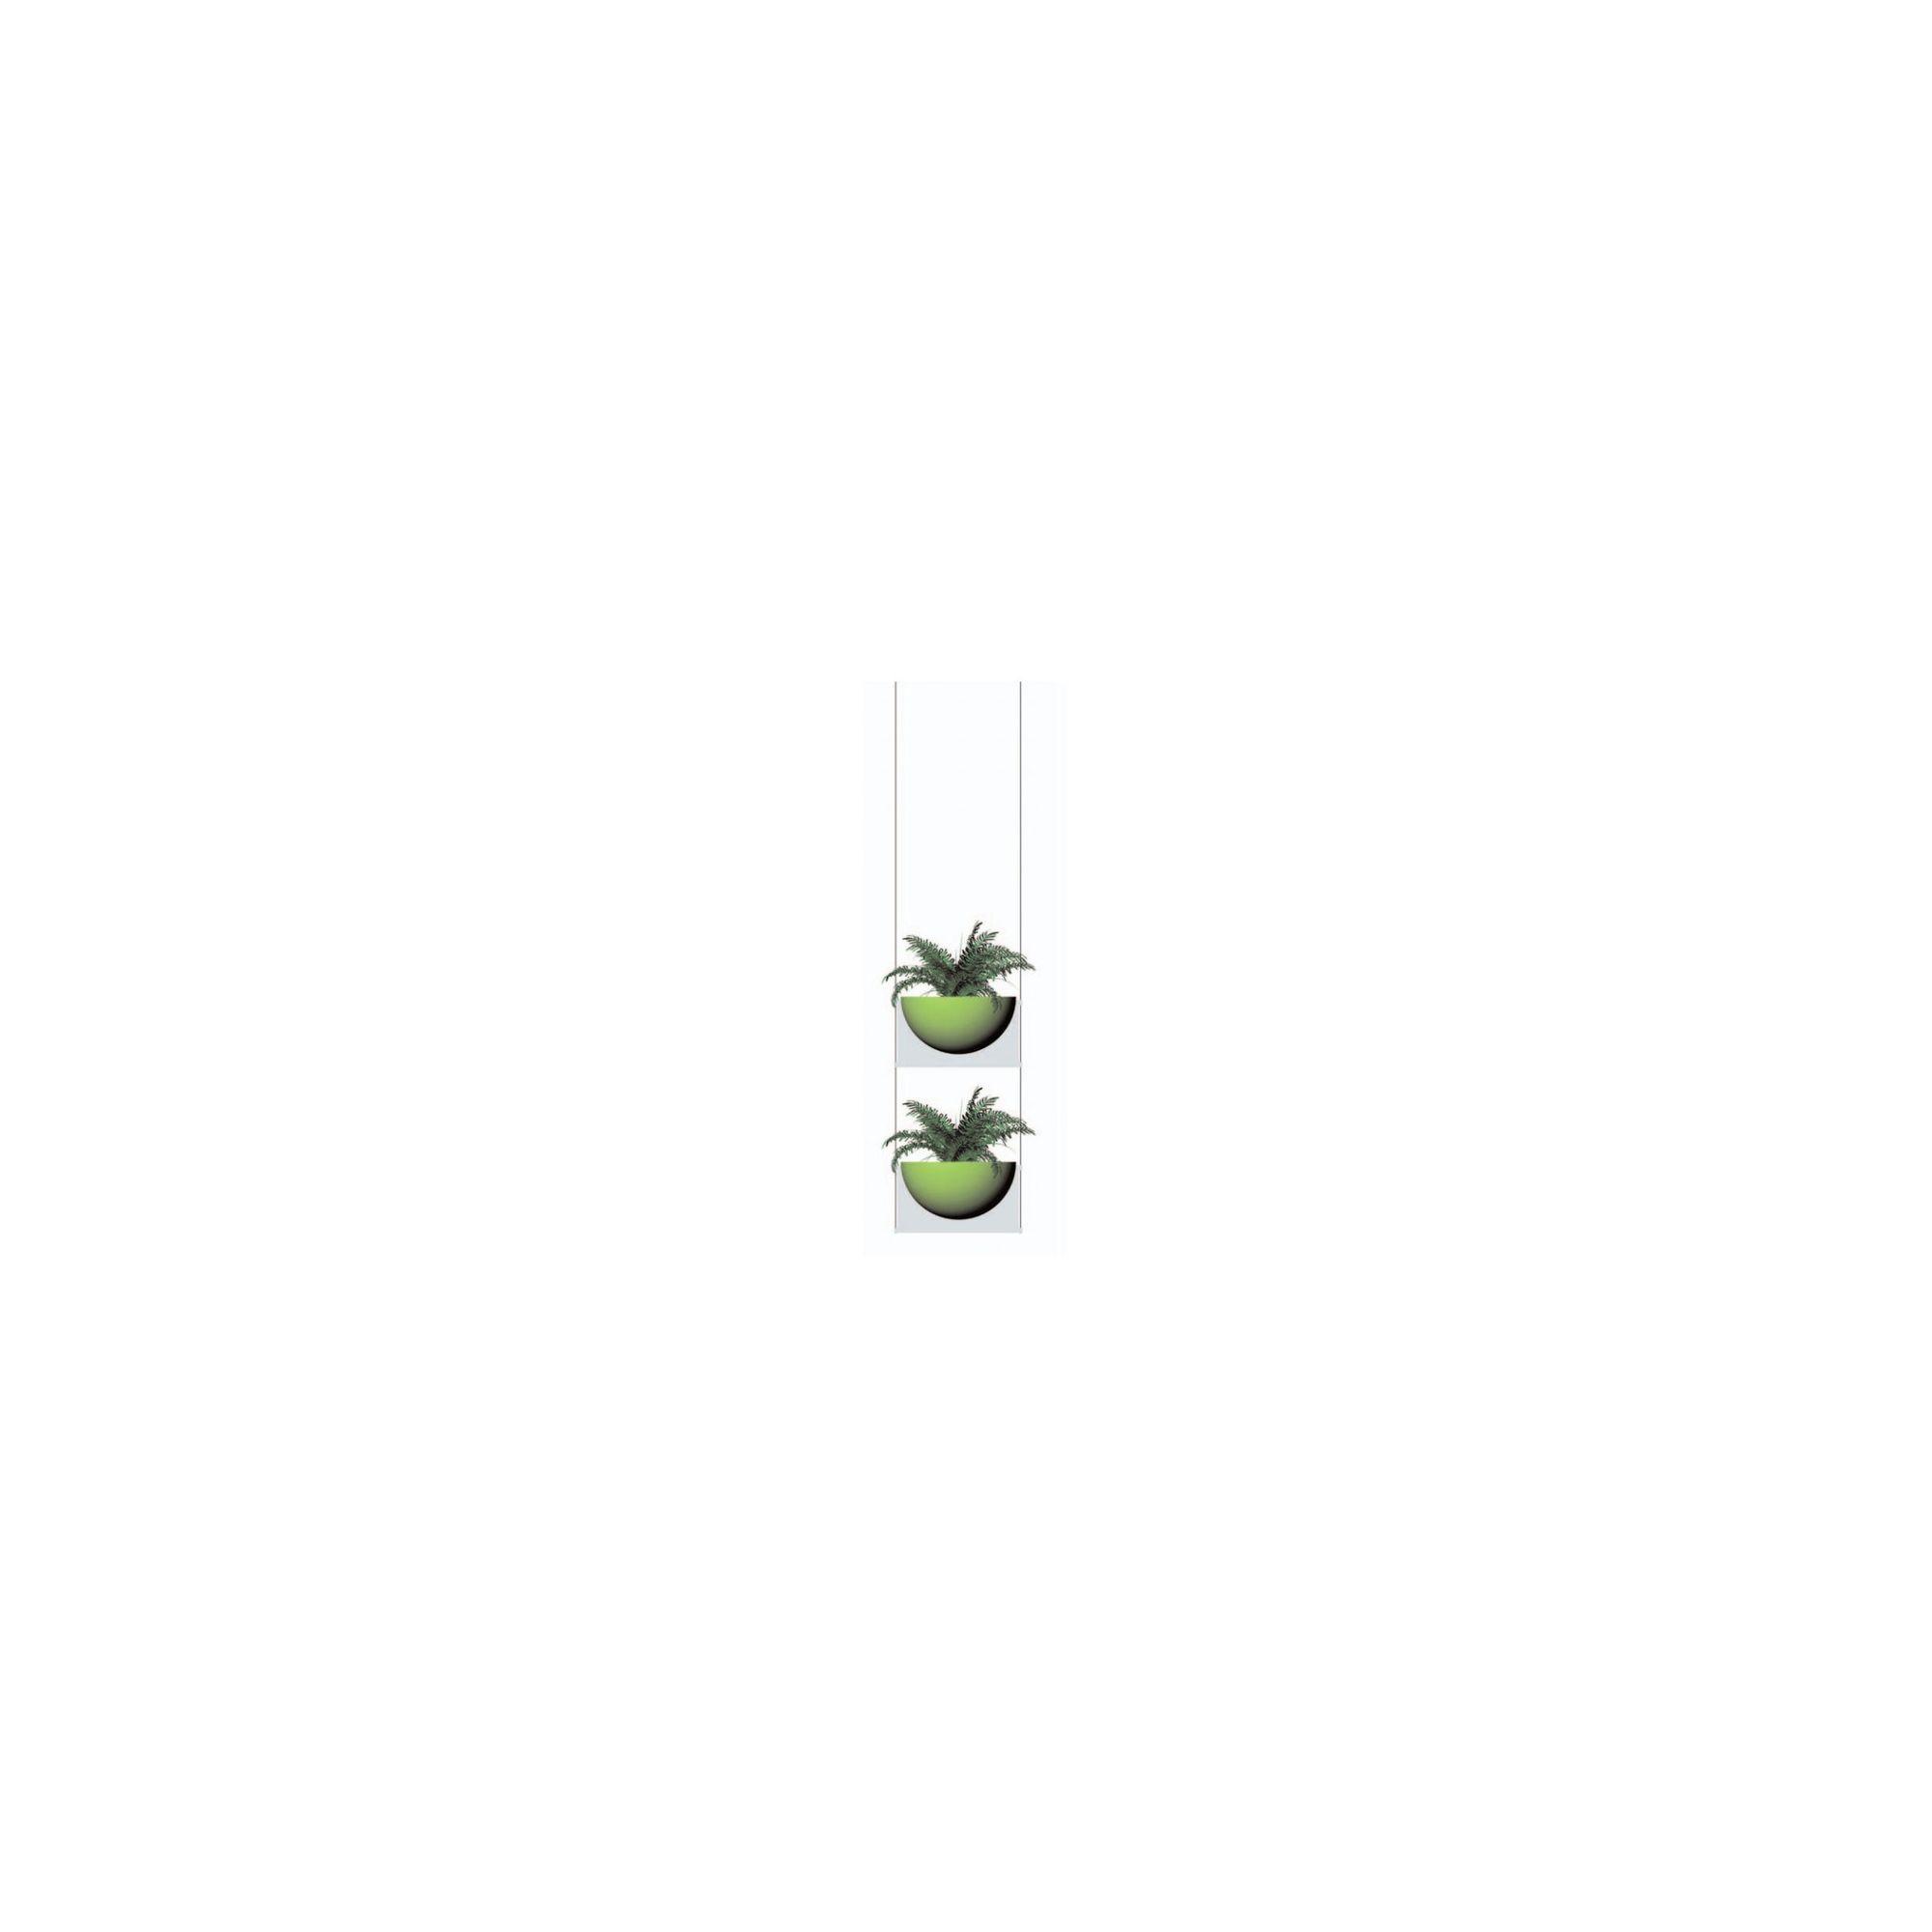 Emporium Positive Design Eebavoglio Double Flower Tray - Green at Tesco Direct